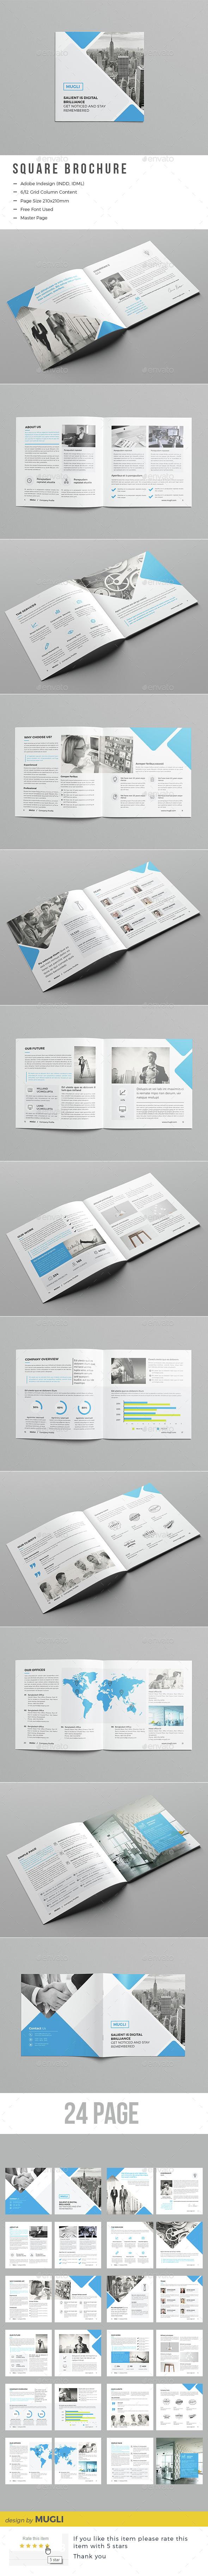 Corporate Square Brochure - Corporate Brochures